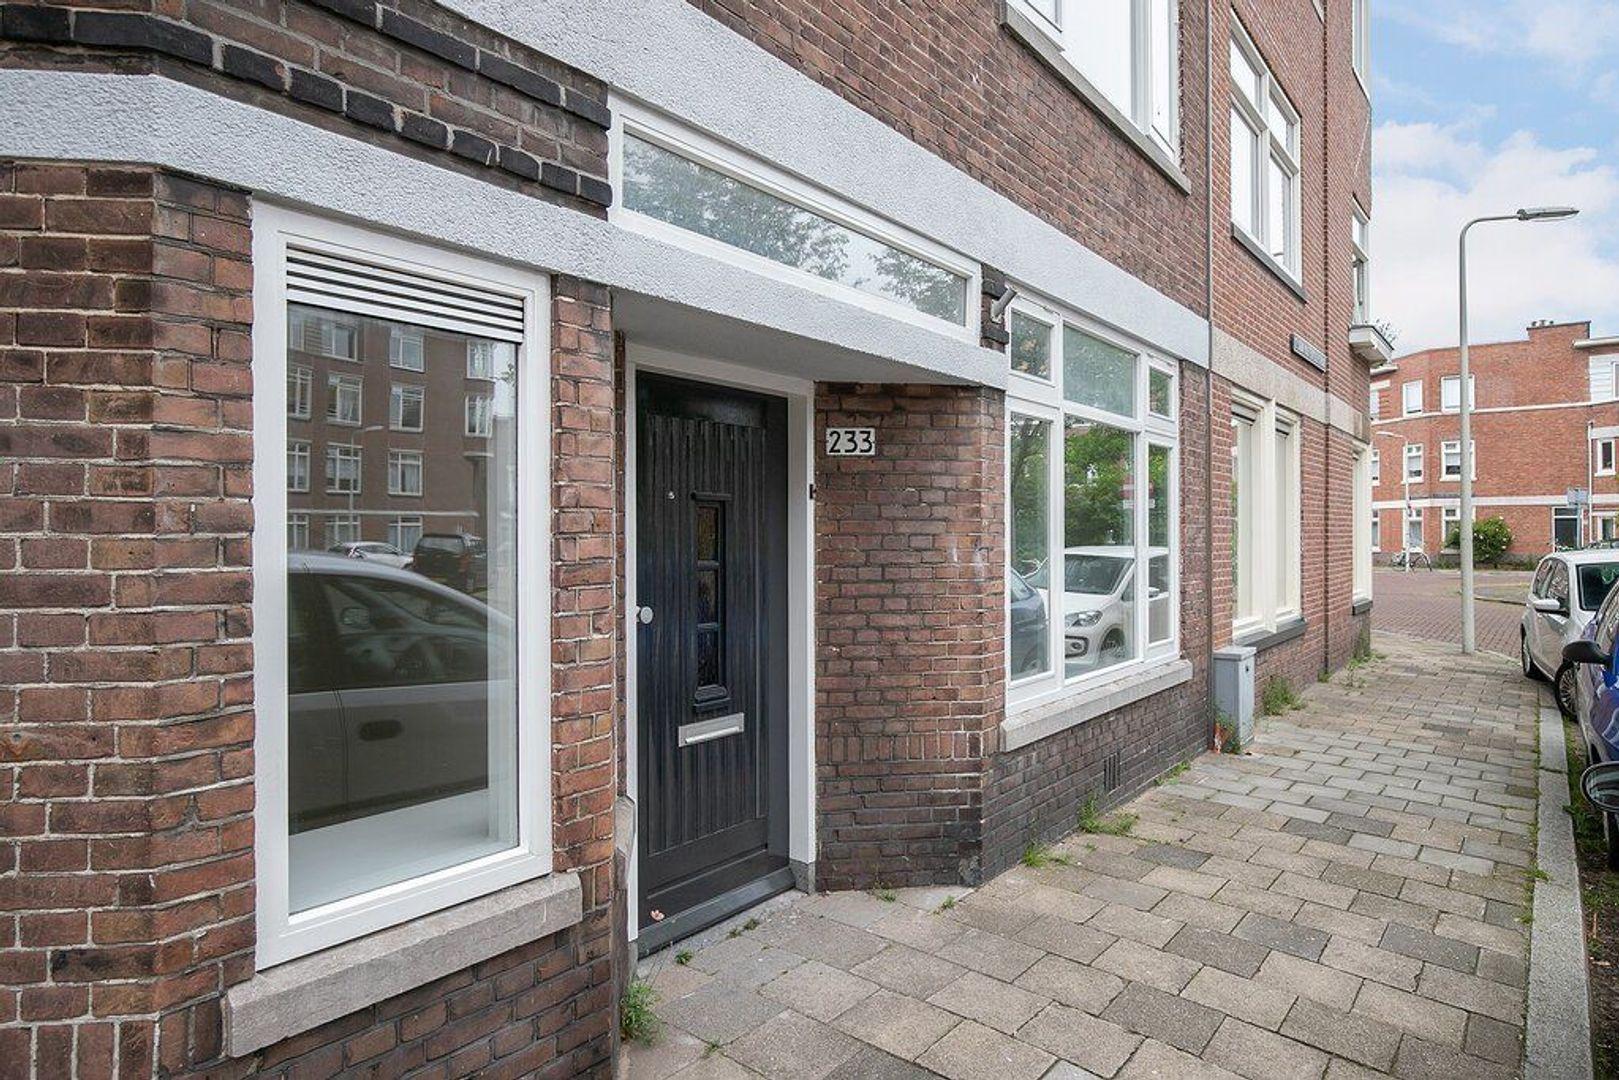 2e Joan Maetsuyckerstraat 233, Den Haag foto-5